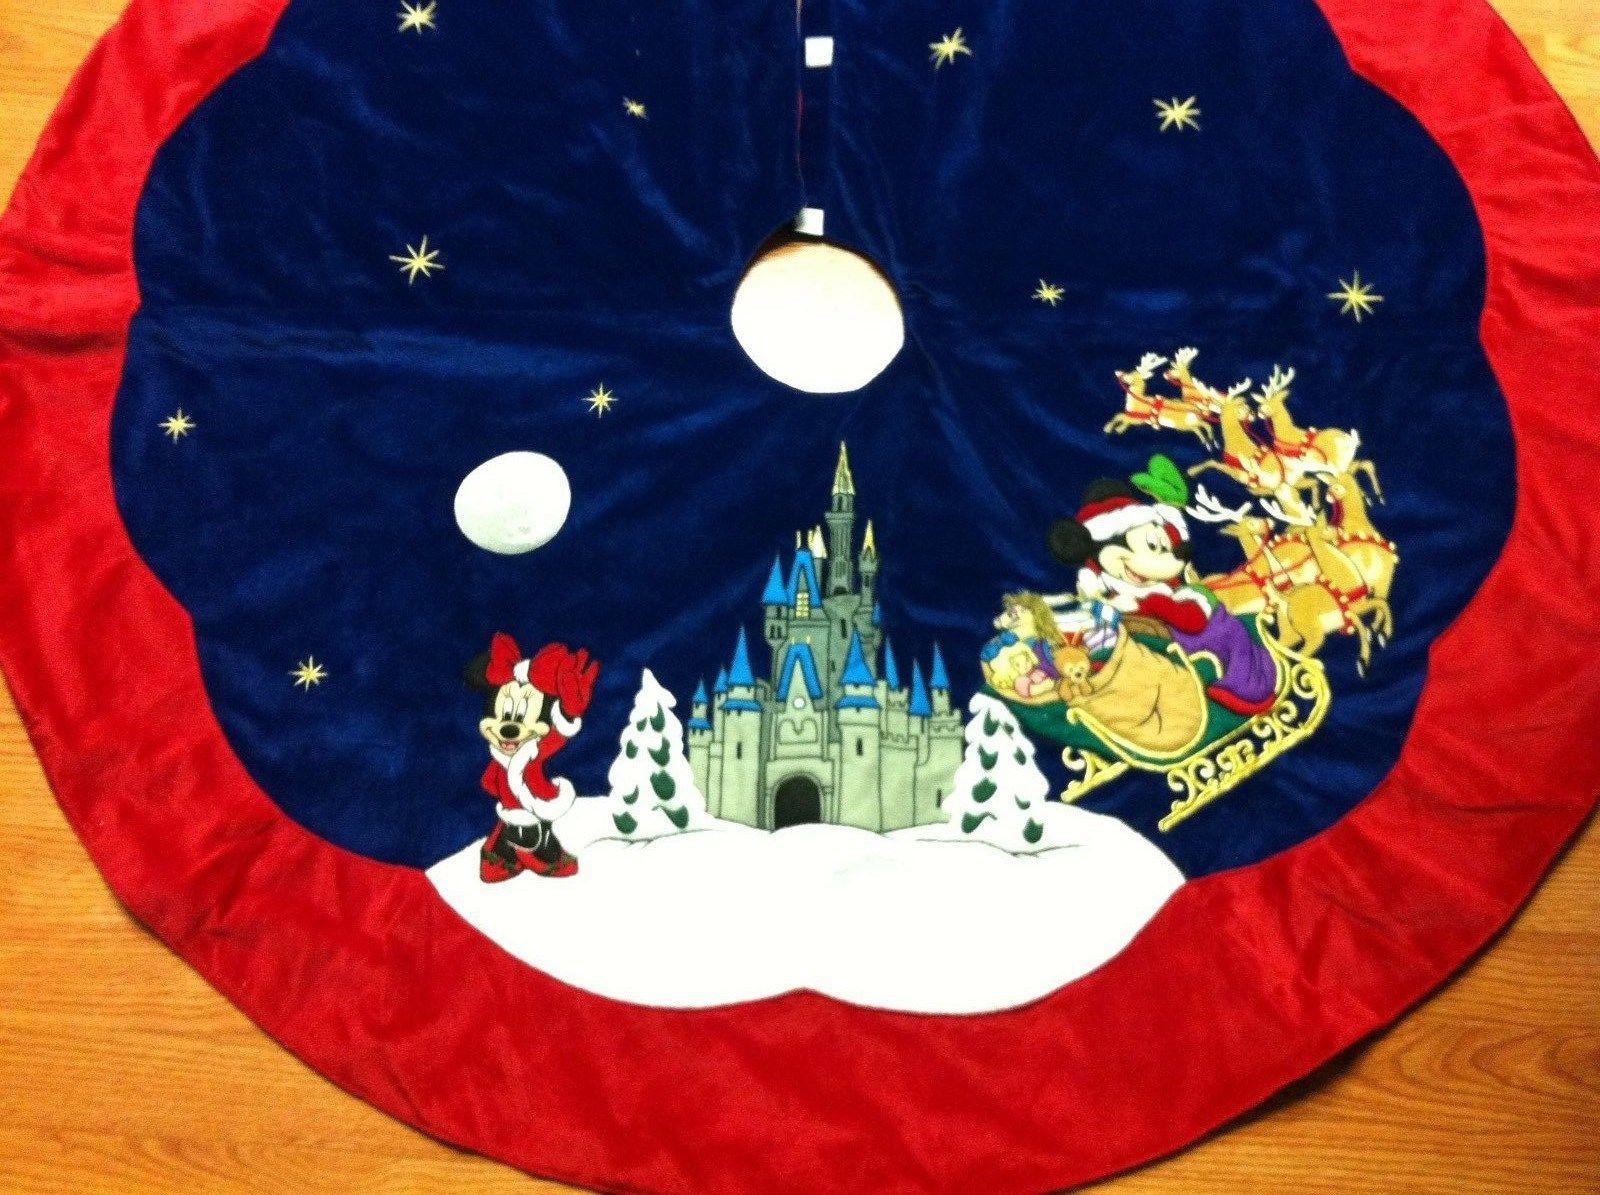 Disney Christmas Tree Skirt I Know Someone Who D Love This